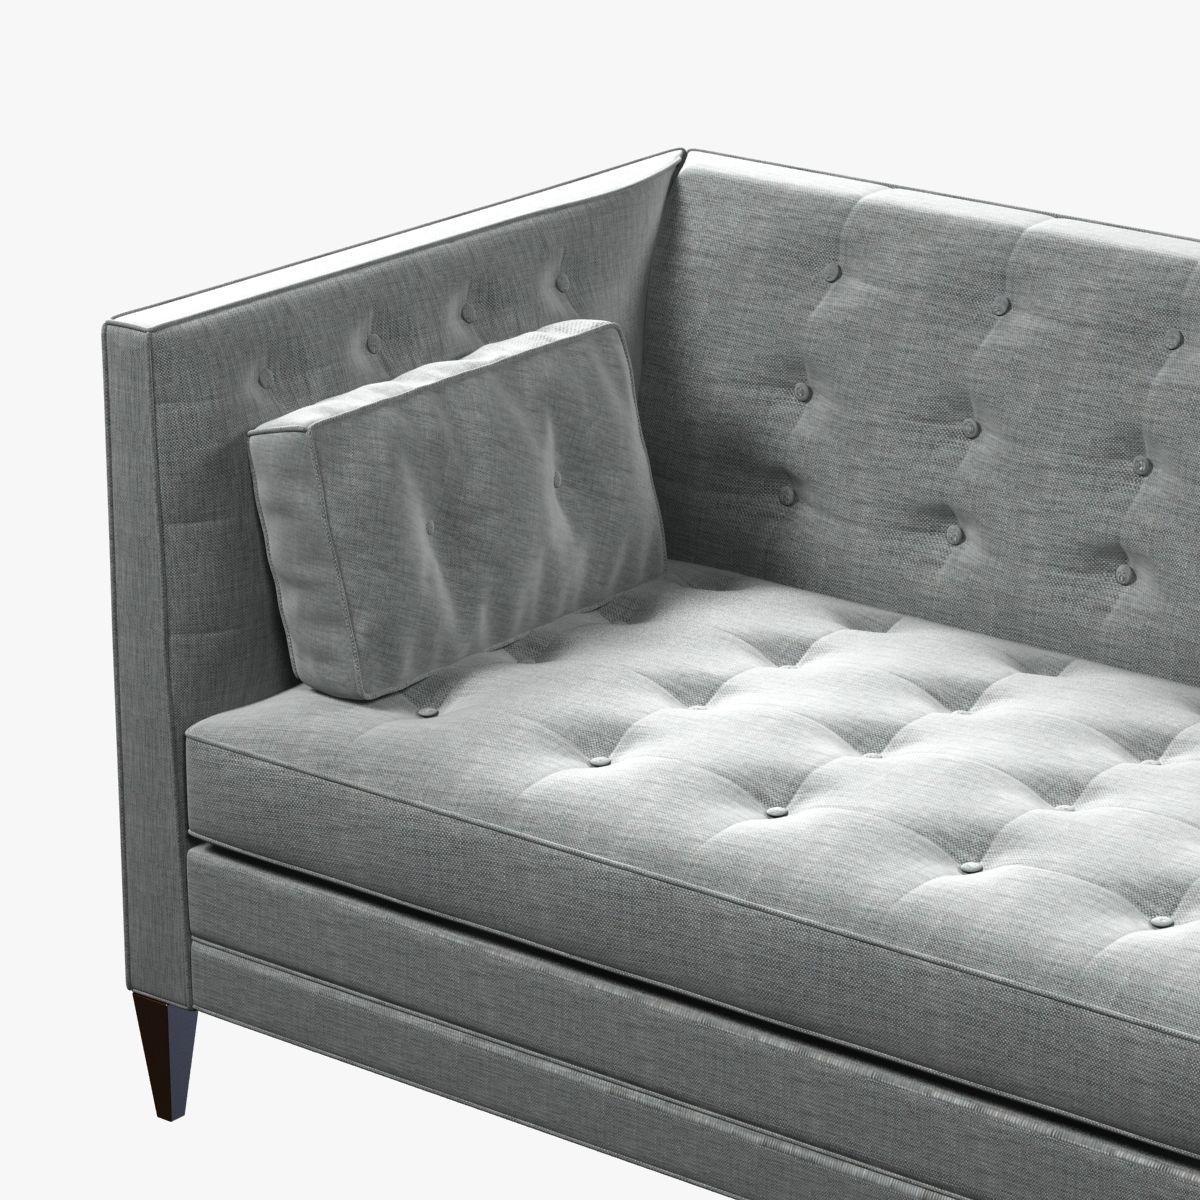 CLANCY TUFTED UPHOLSTERED SOFA IN VANGOGH FOG D Model MAX OBJ DS - Tufted upholstered sofa